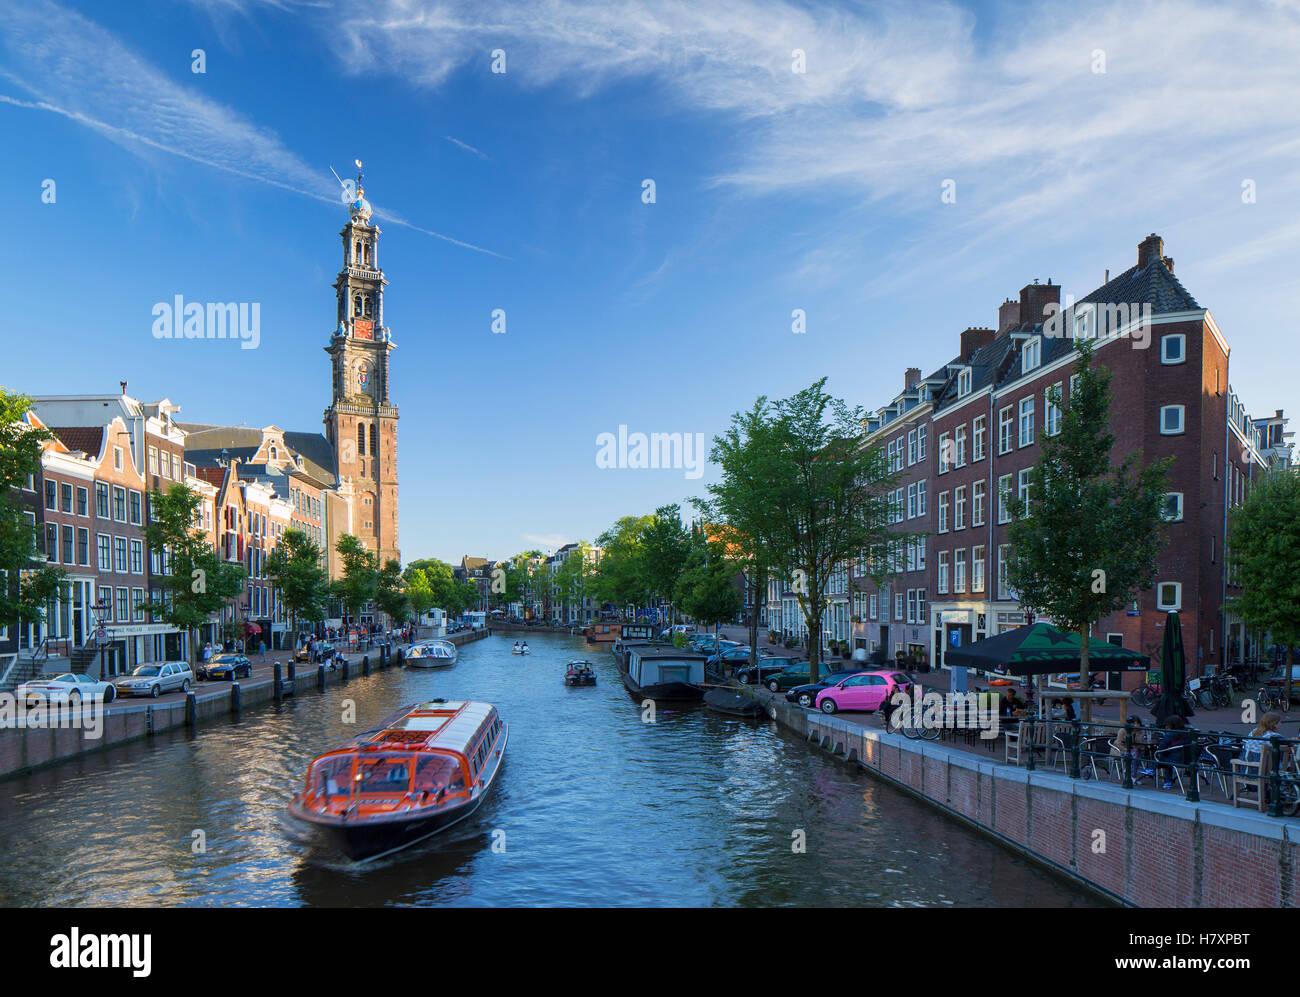 Prinsengracht canal and Westerkerk, Amsterdam, Netherlands Stock Photo